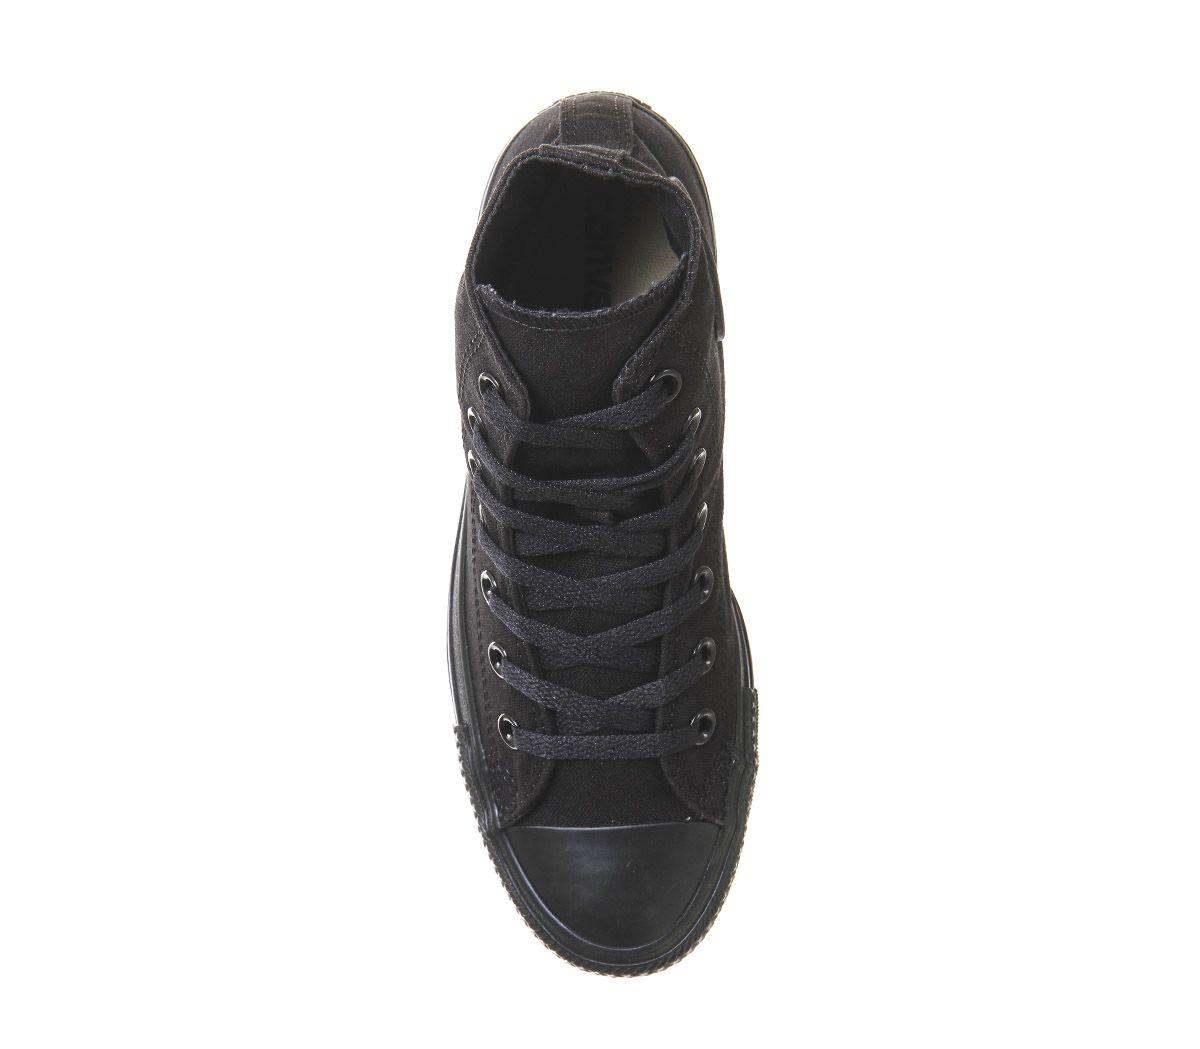 Womens-Converse-All-Star-Hi-Flash-Black-Mono-Trainers-Shoes thumbnail 4